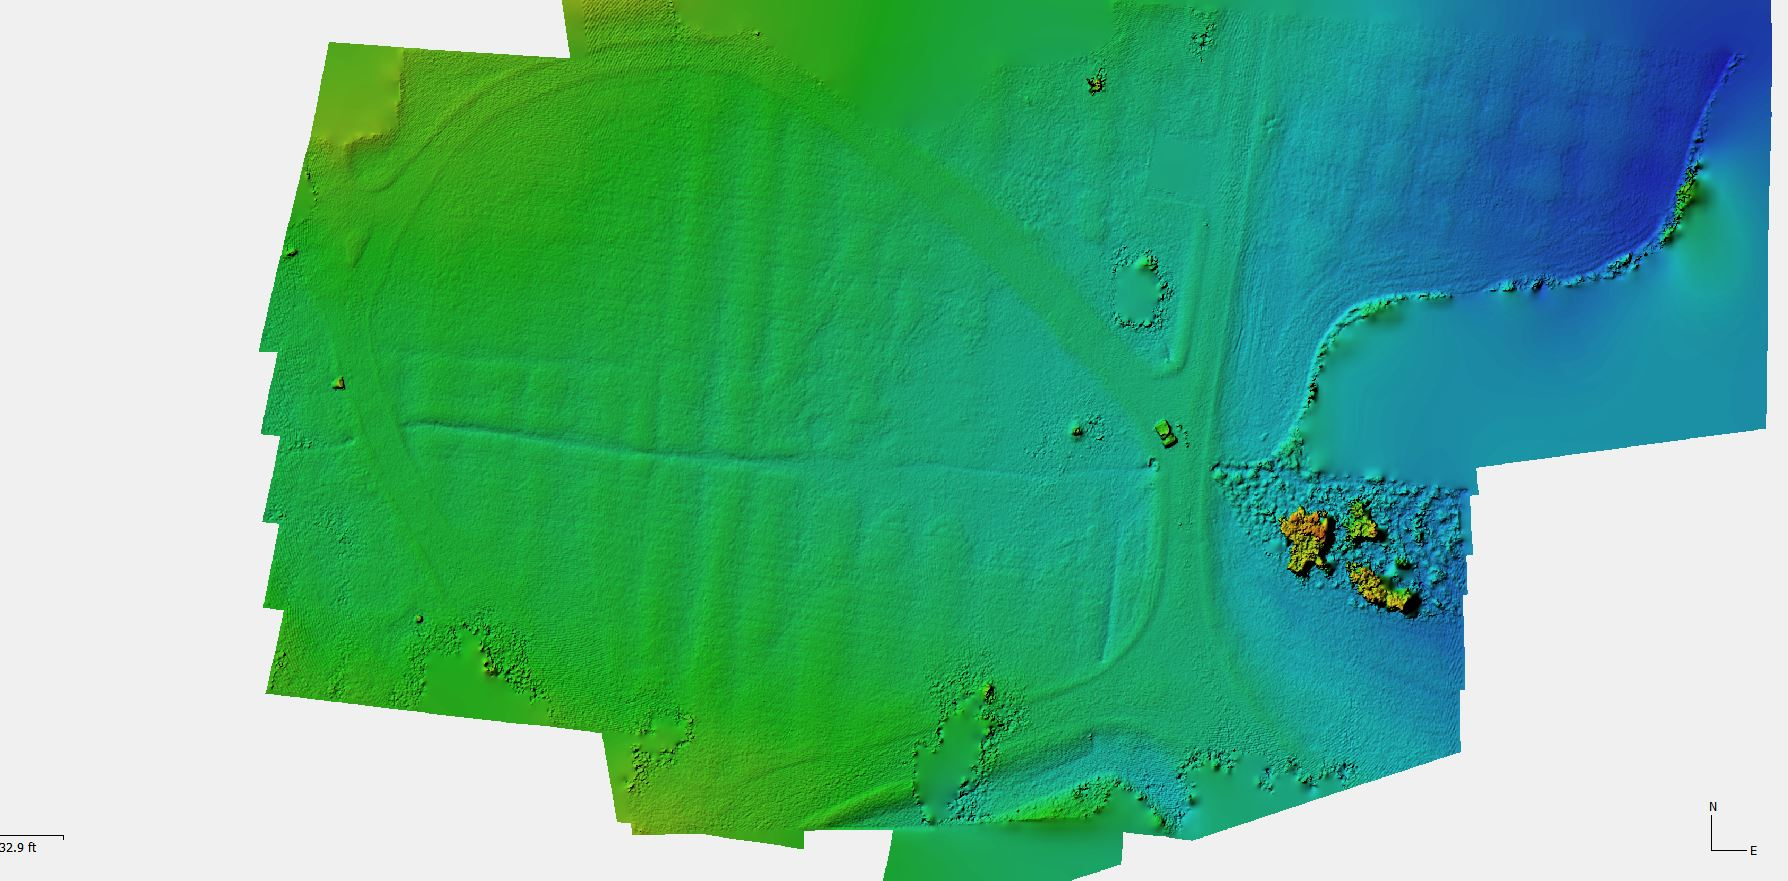 Smith's Field LIDAR